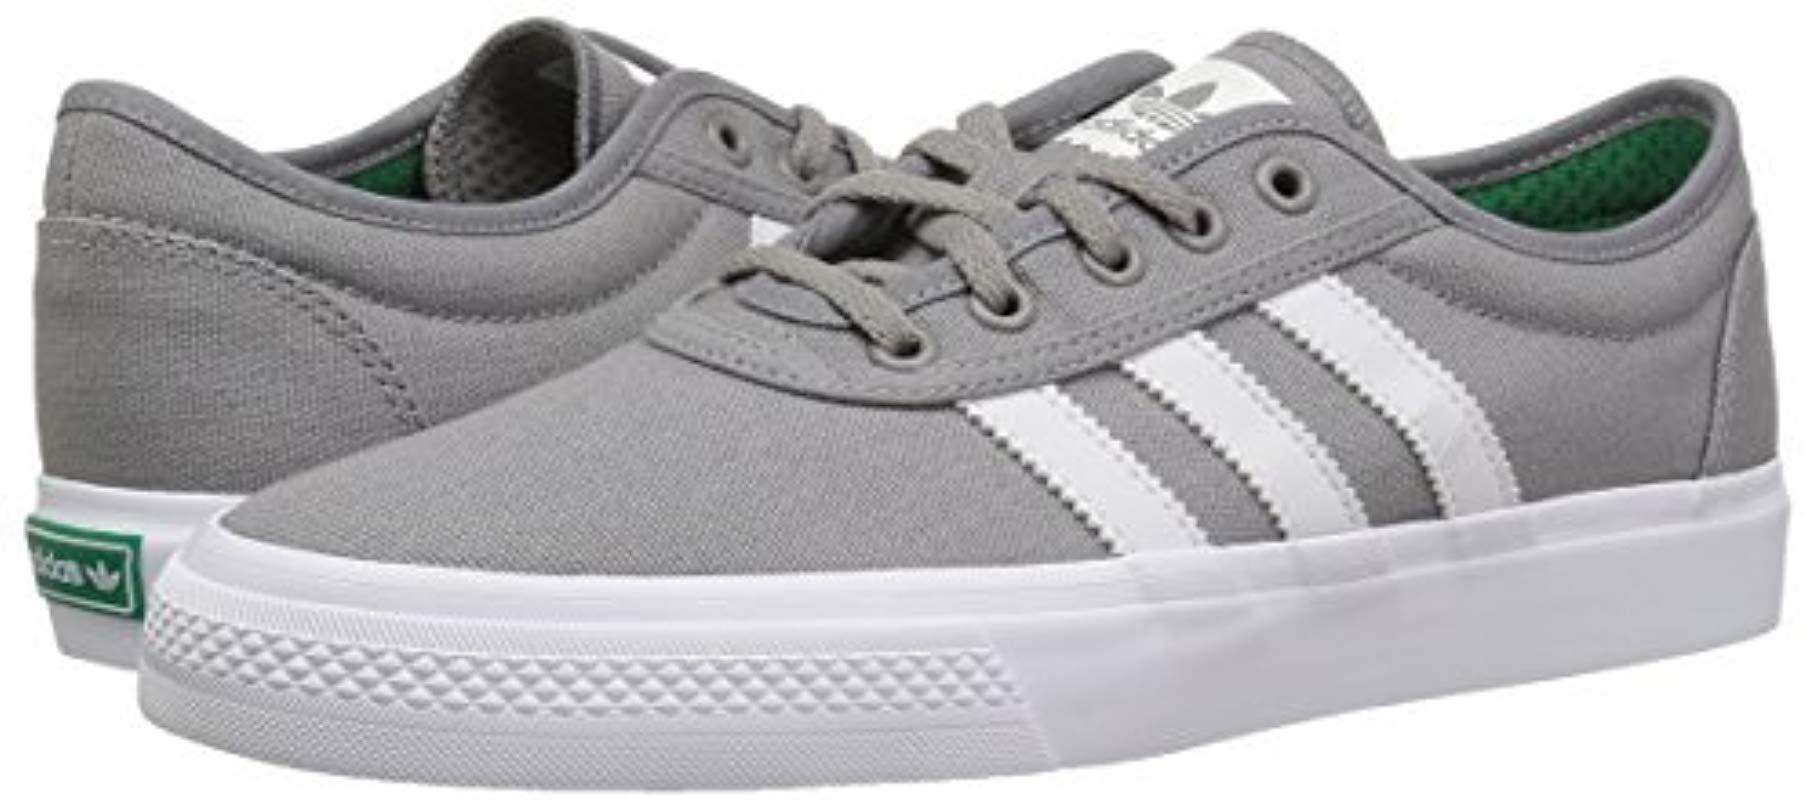 Adi-ease Skate Shoe, Solid Grey/crystal White, 6.5 M Us